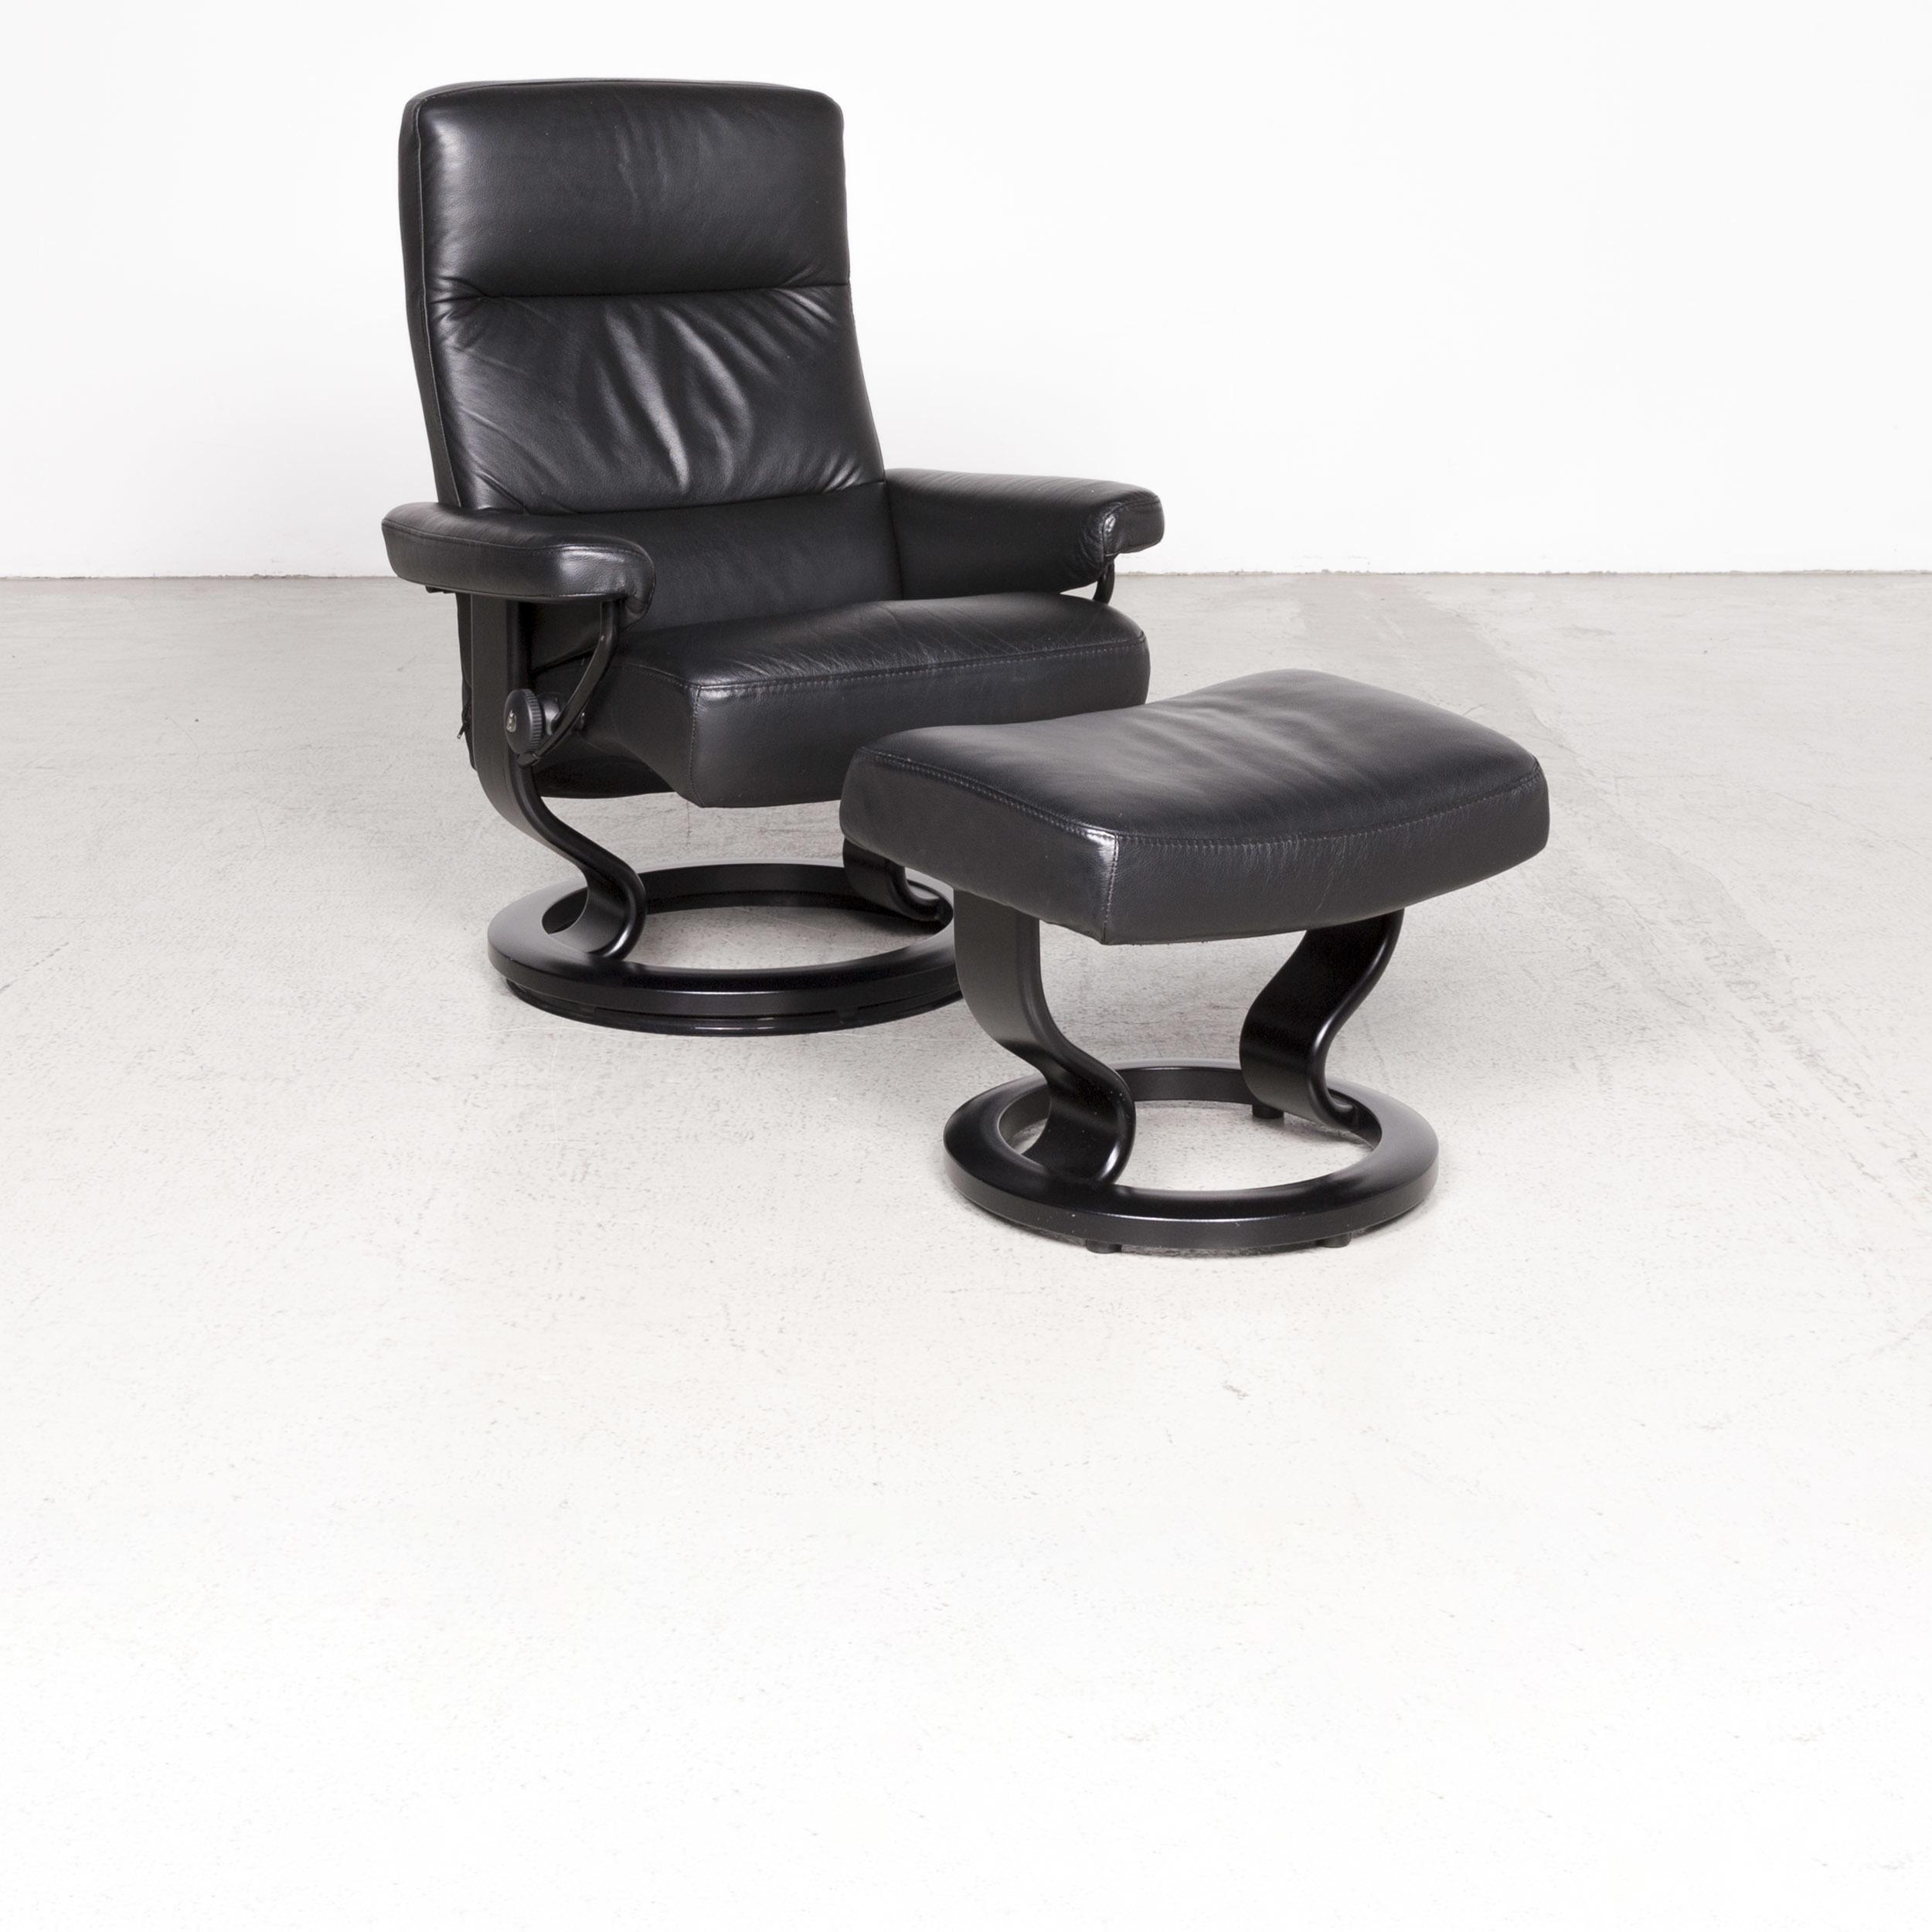 Swell Stressless Atlantic M Designer Leather Armchair With Stool Creativecarmelina Interior Chair Design Creativecarmelinacom